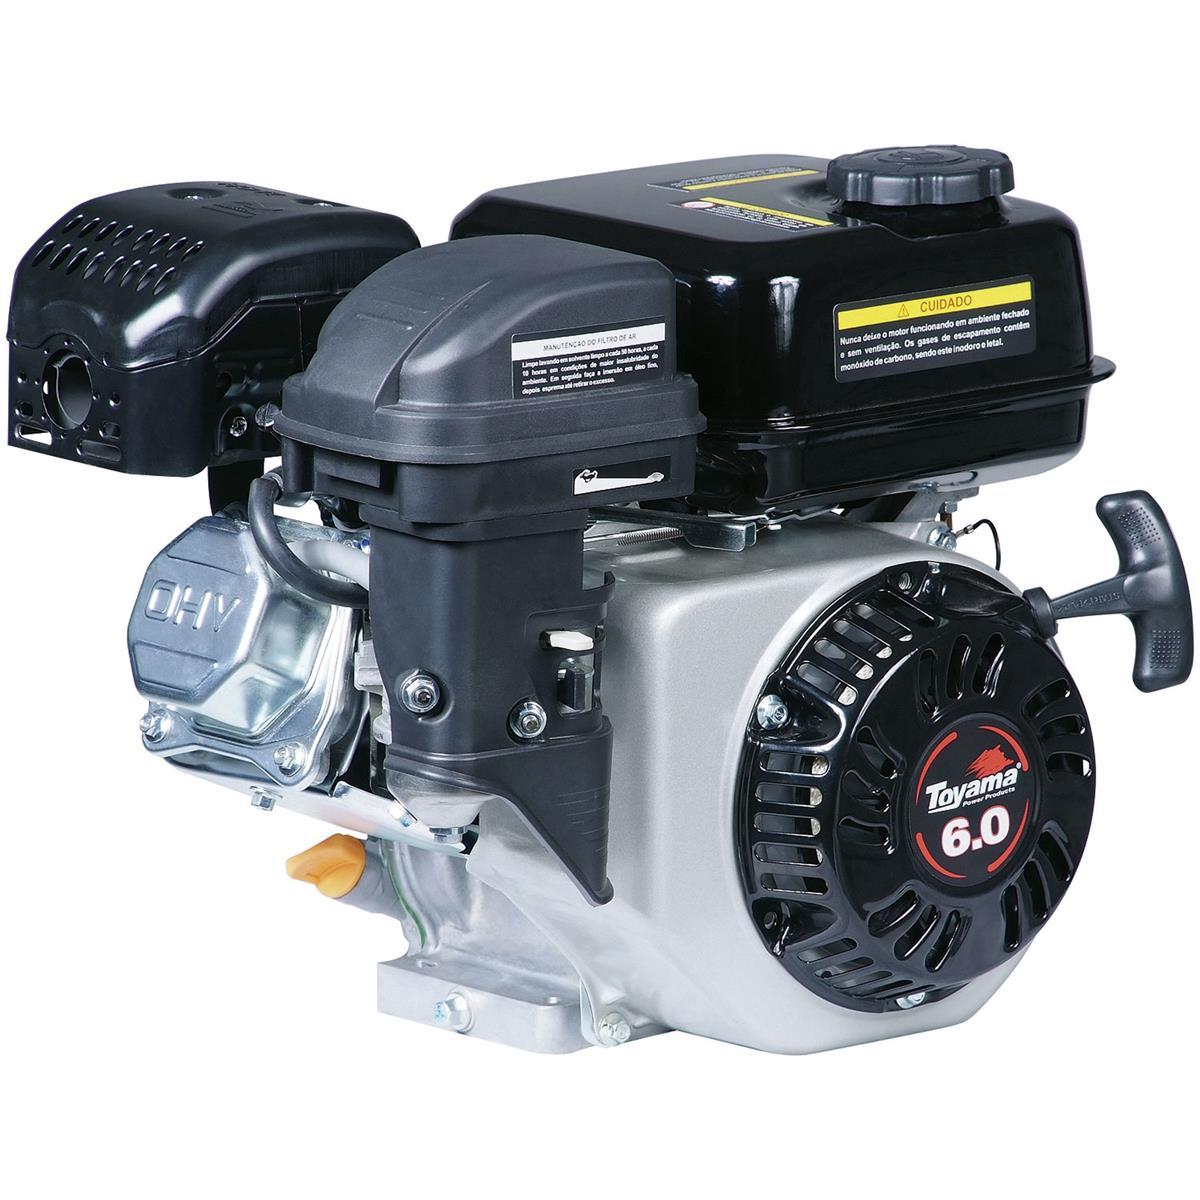 Motor A Gasolina 4 Tempos 6Hp 180Cc 3600Rpm Tf60fx2 Toyama